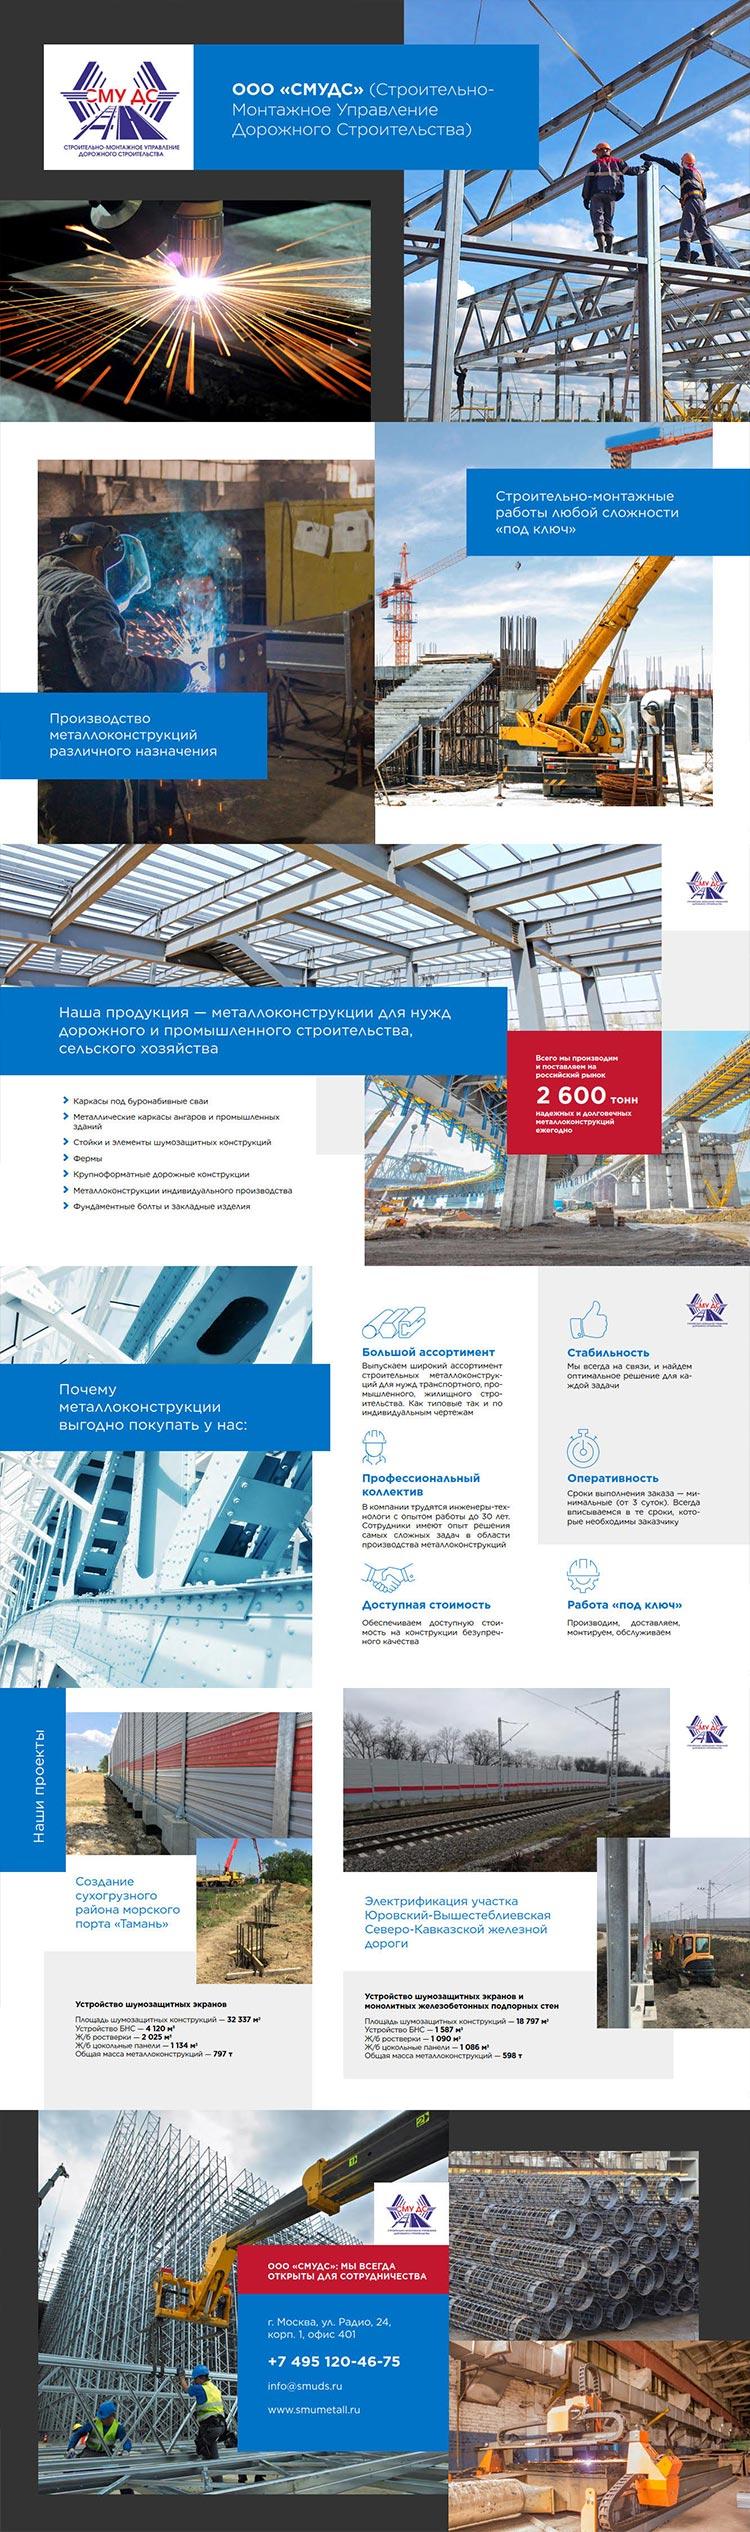 zakazat-Prezentacija-metallokonstrukcij-kompanii